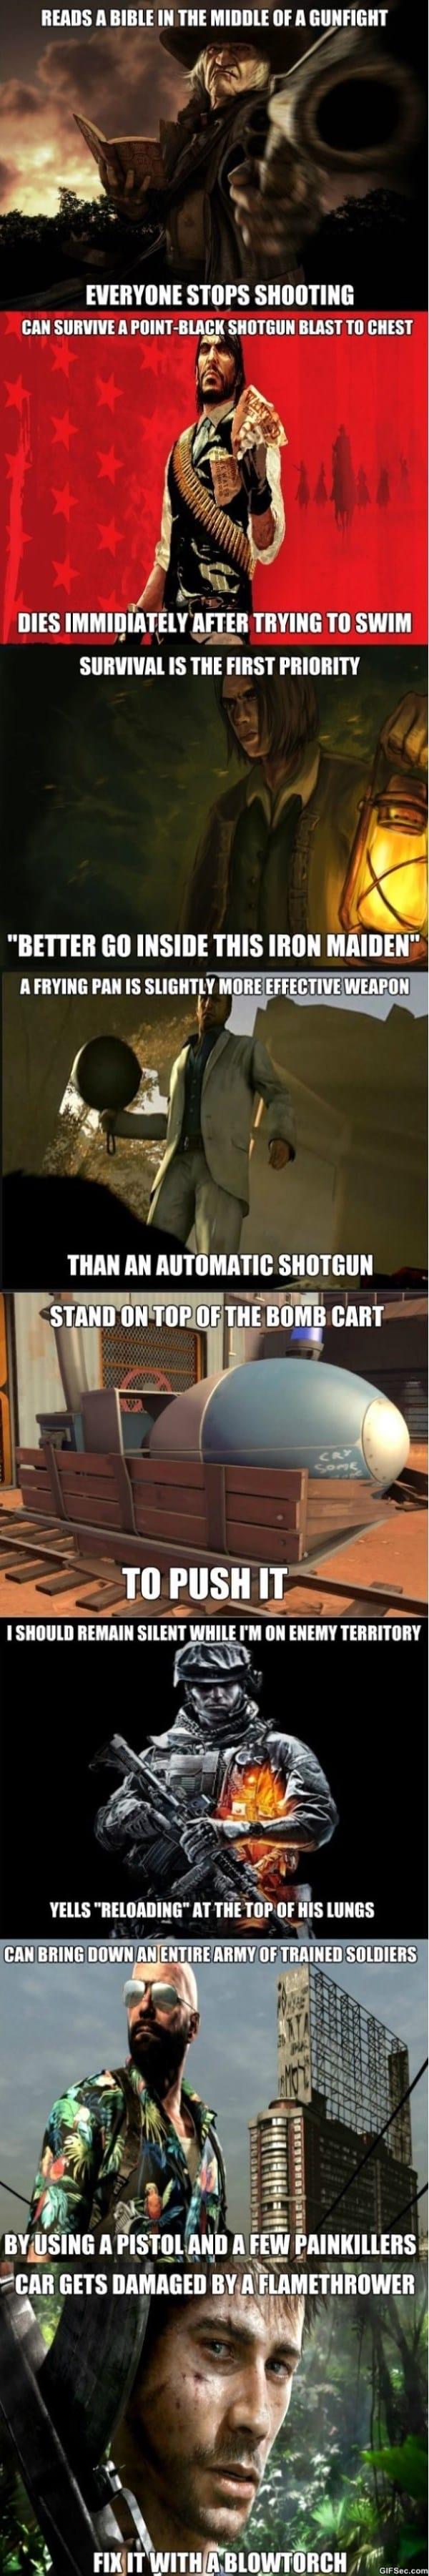 funny-game-logic-compilation-memes